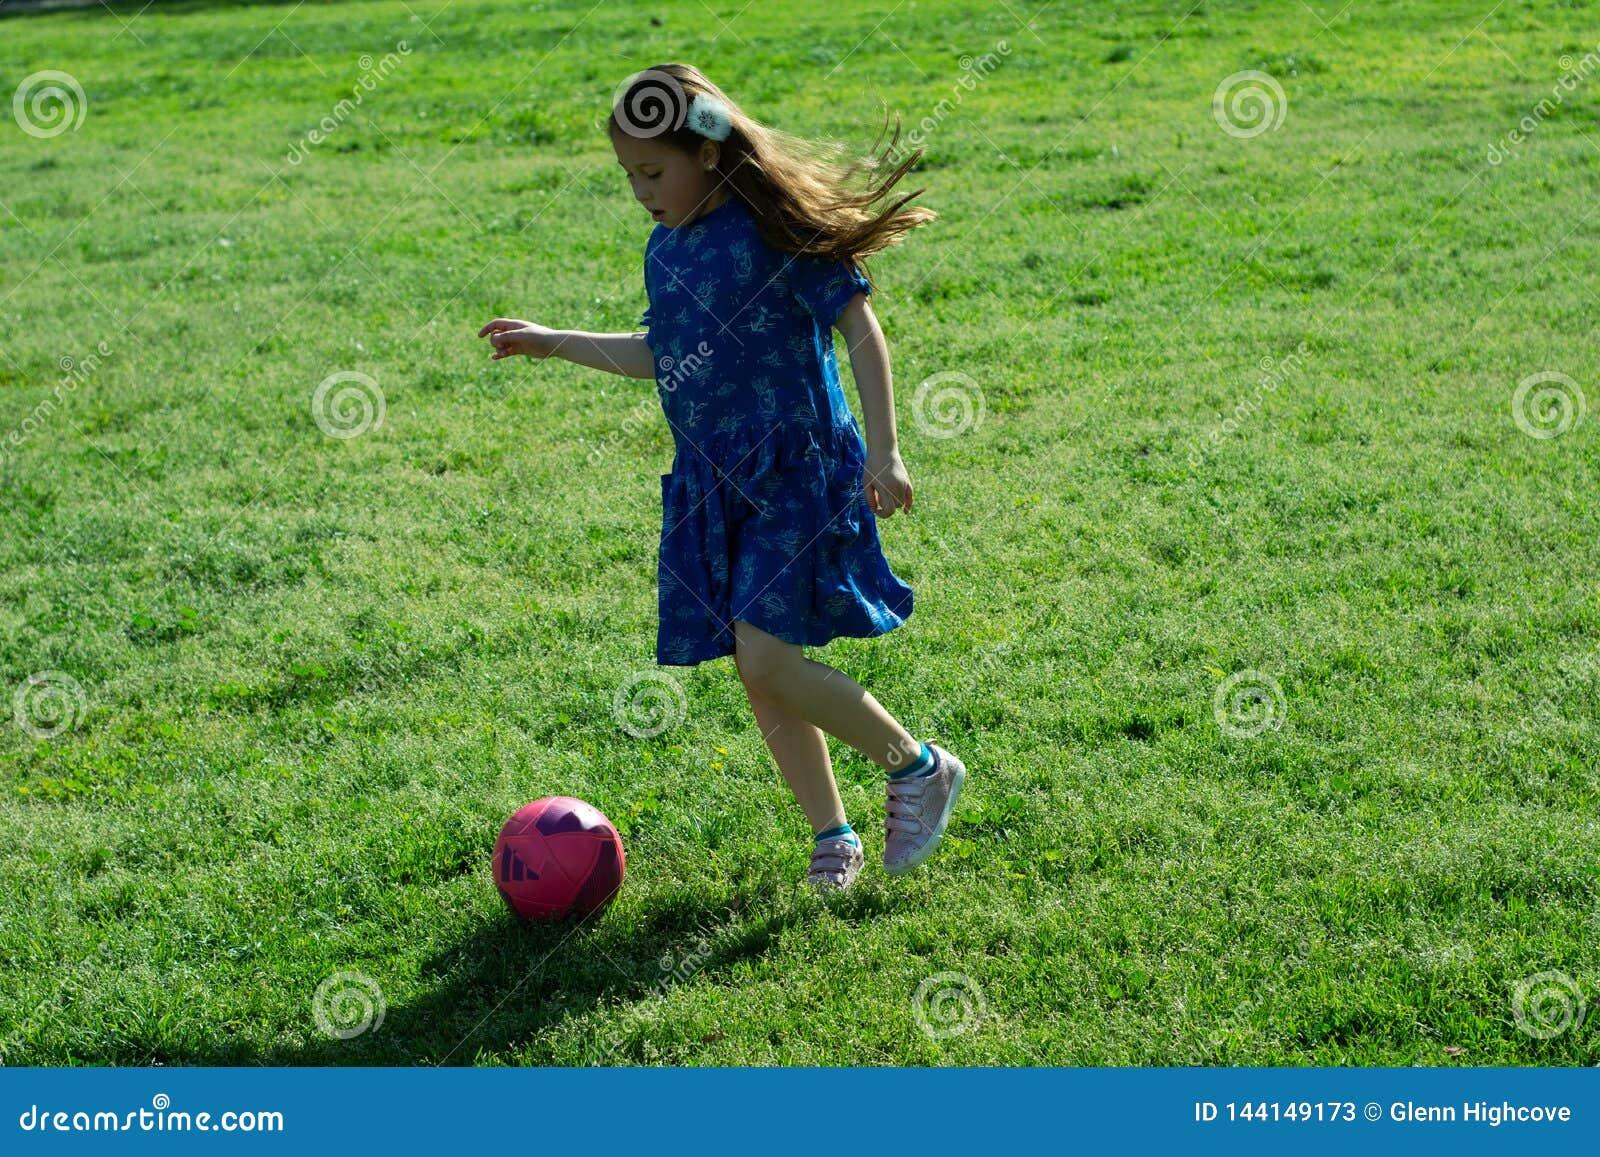 Meisje in Blauwe Kleding het schoppen voetbalbal op Groen Gras